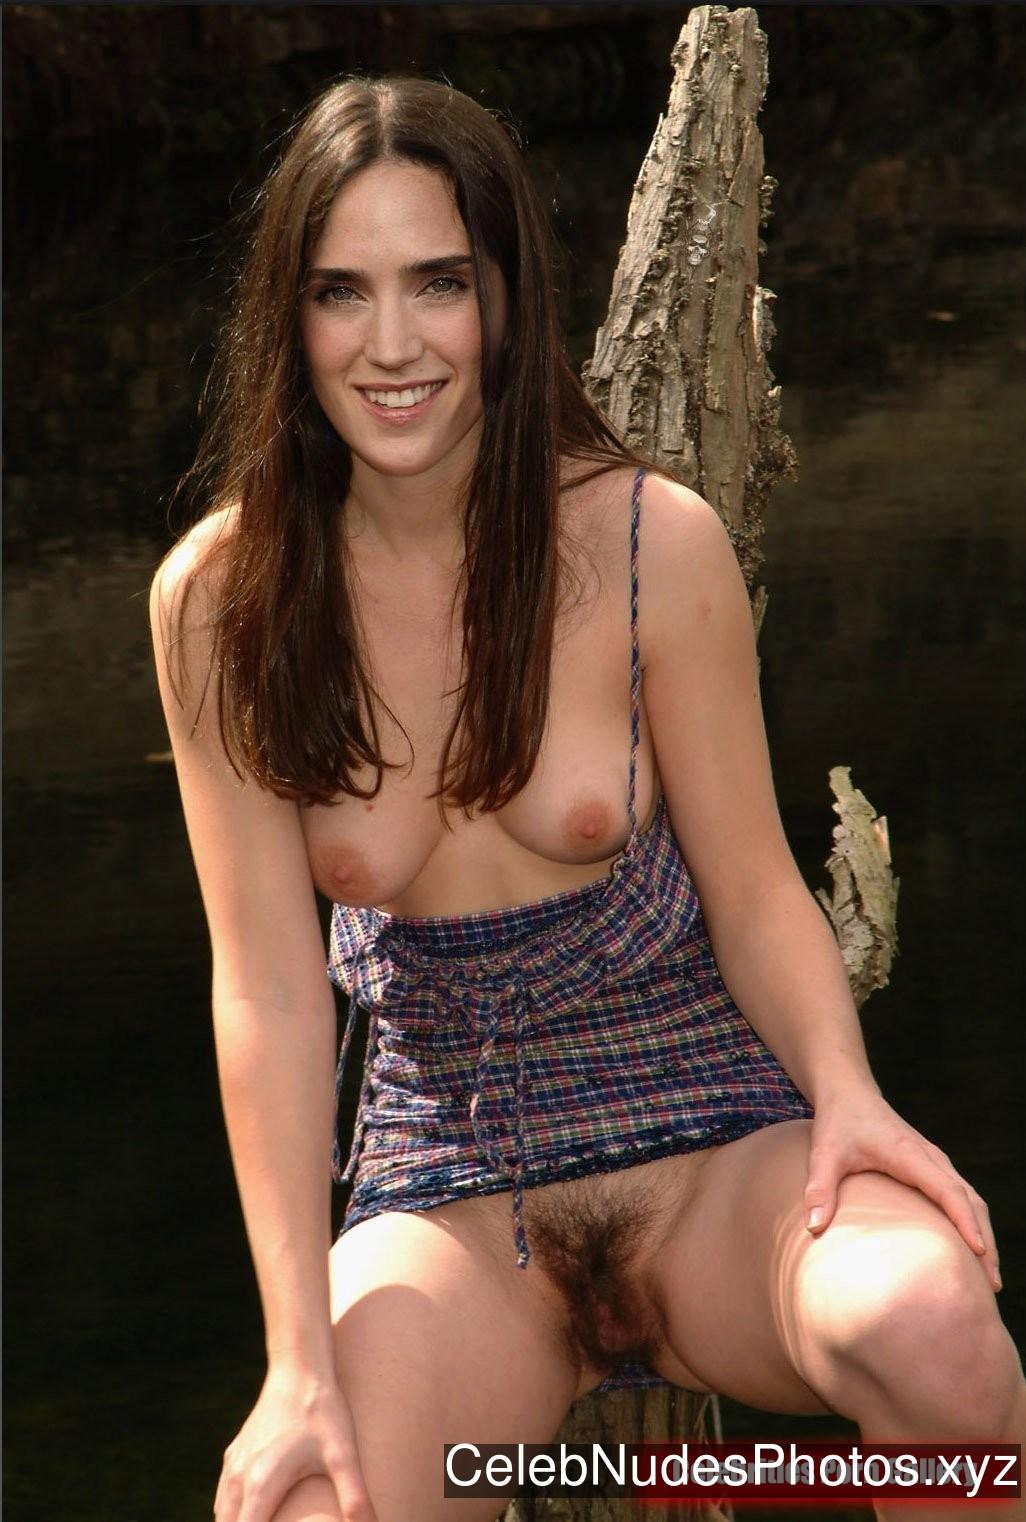 Celebrities nude pic